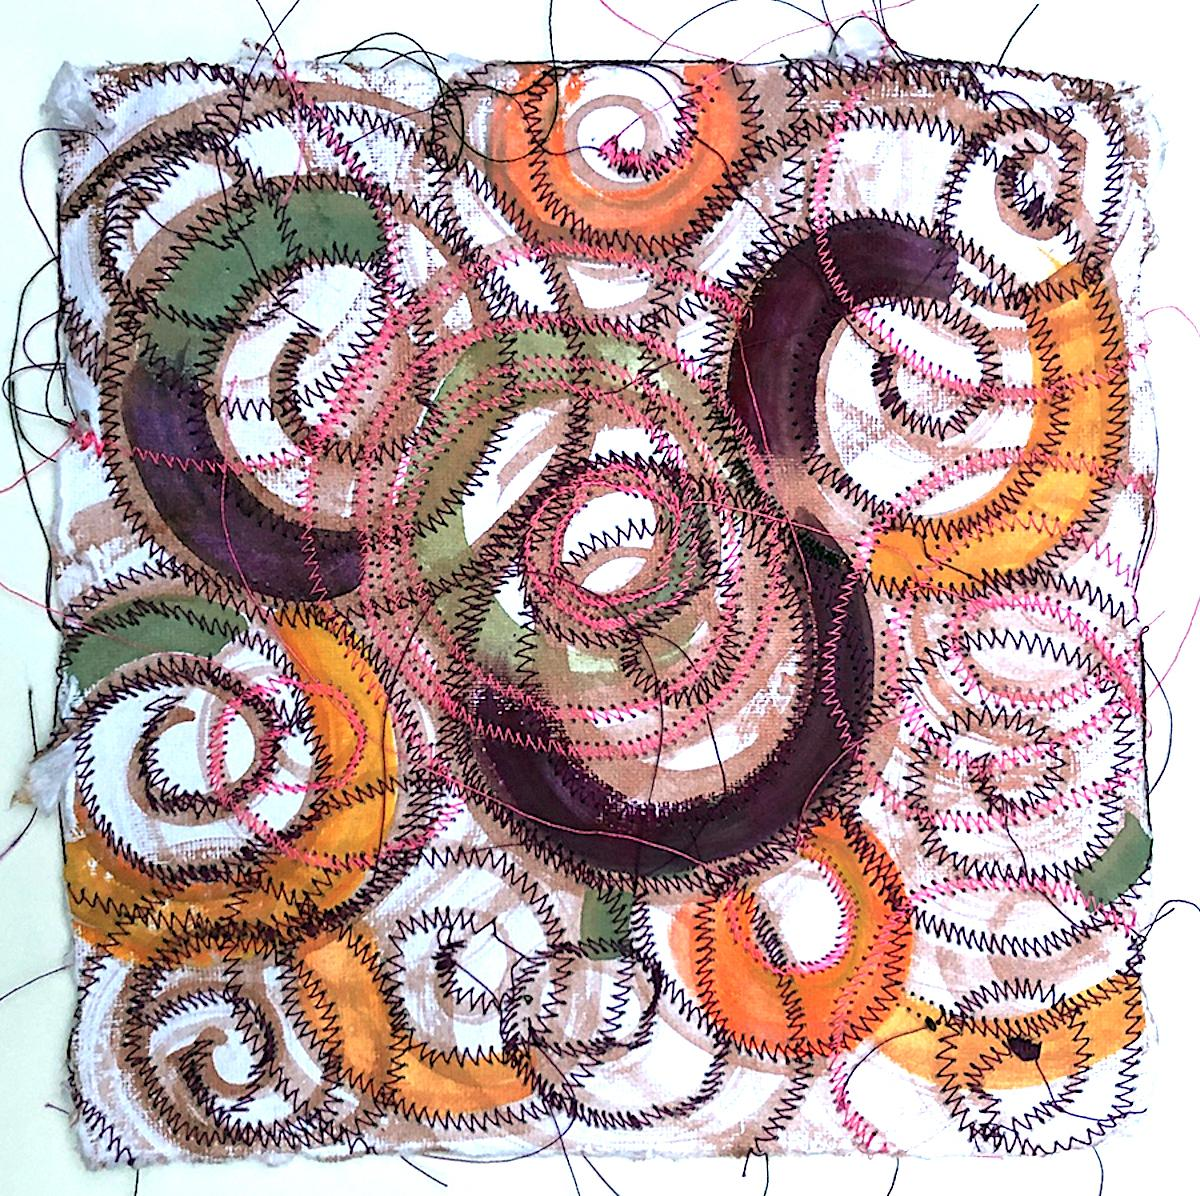 Alexandra Rutsch Brock, Currents, 2020, gouache, thread, 8 x 8 in